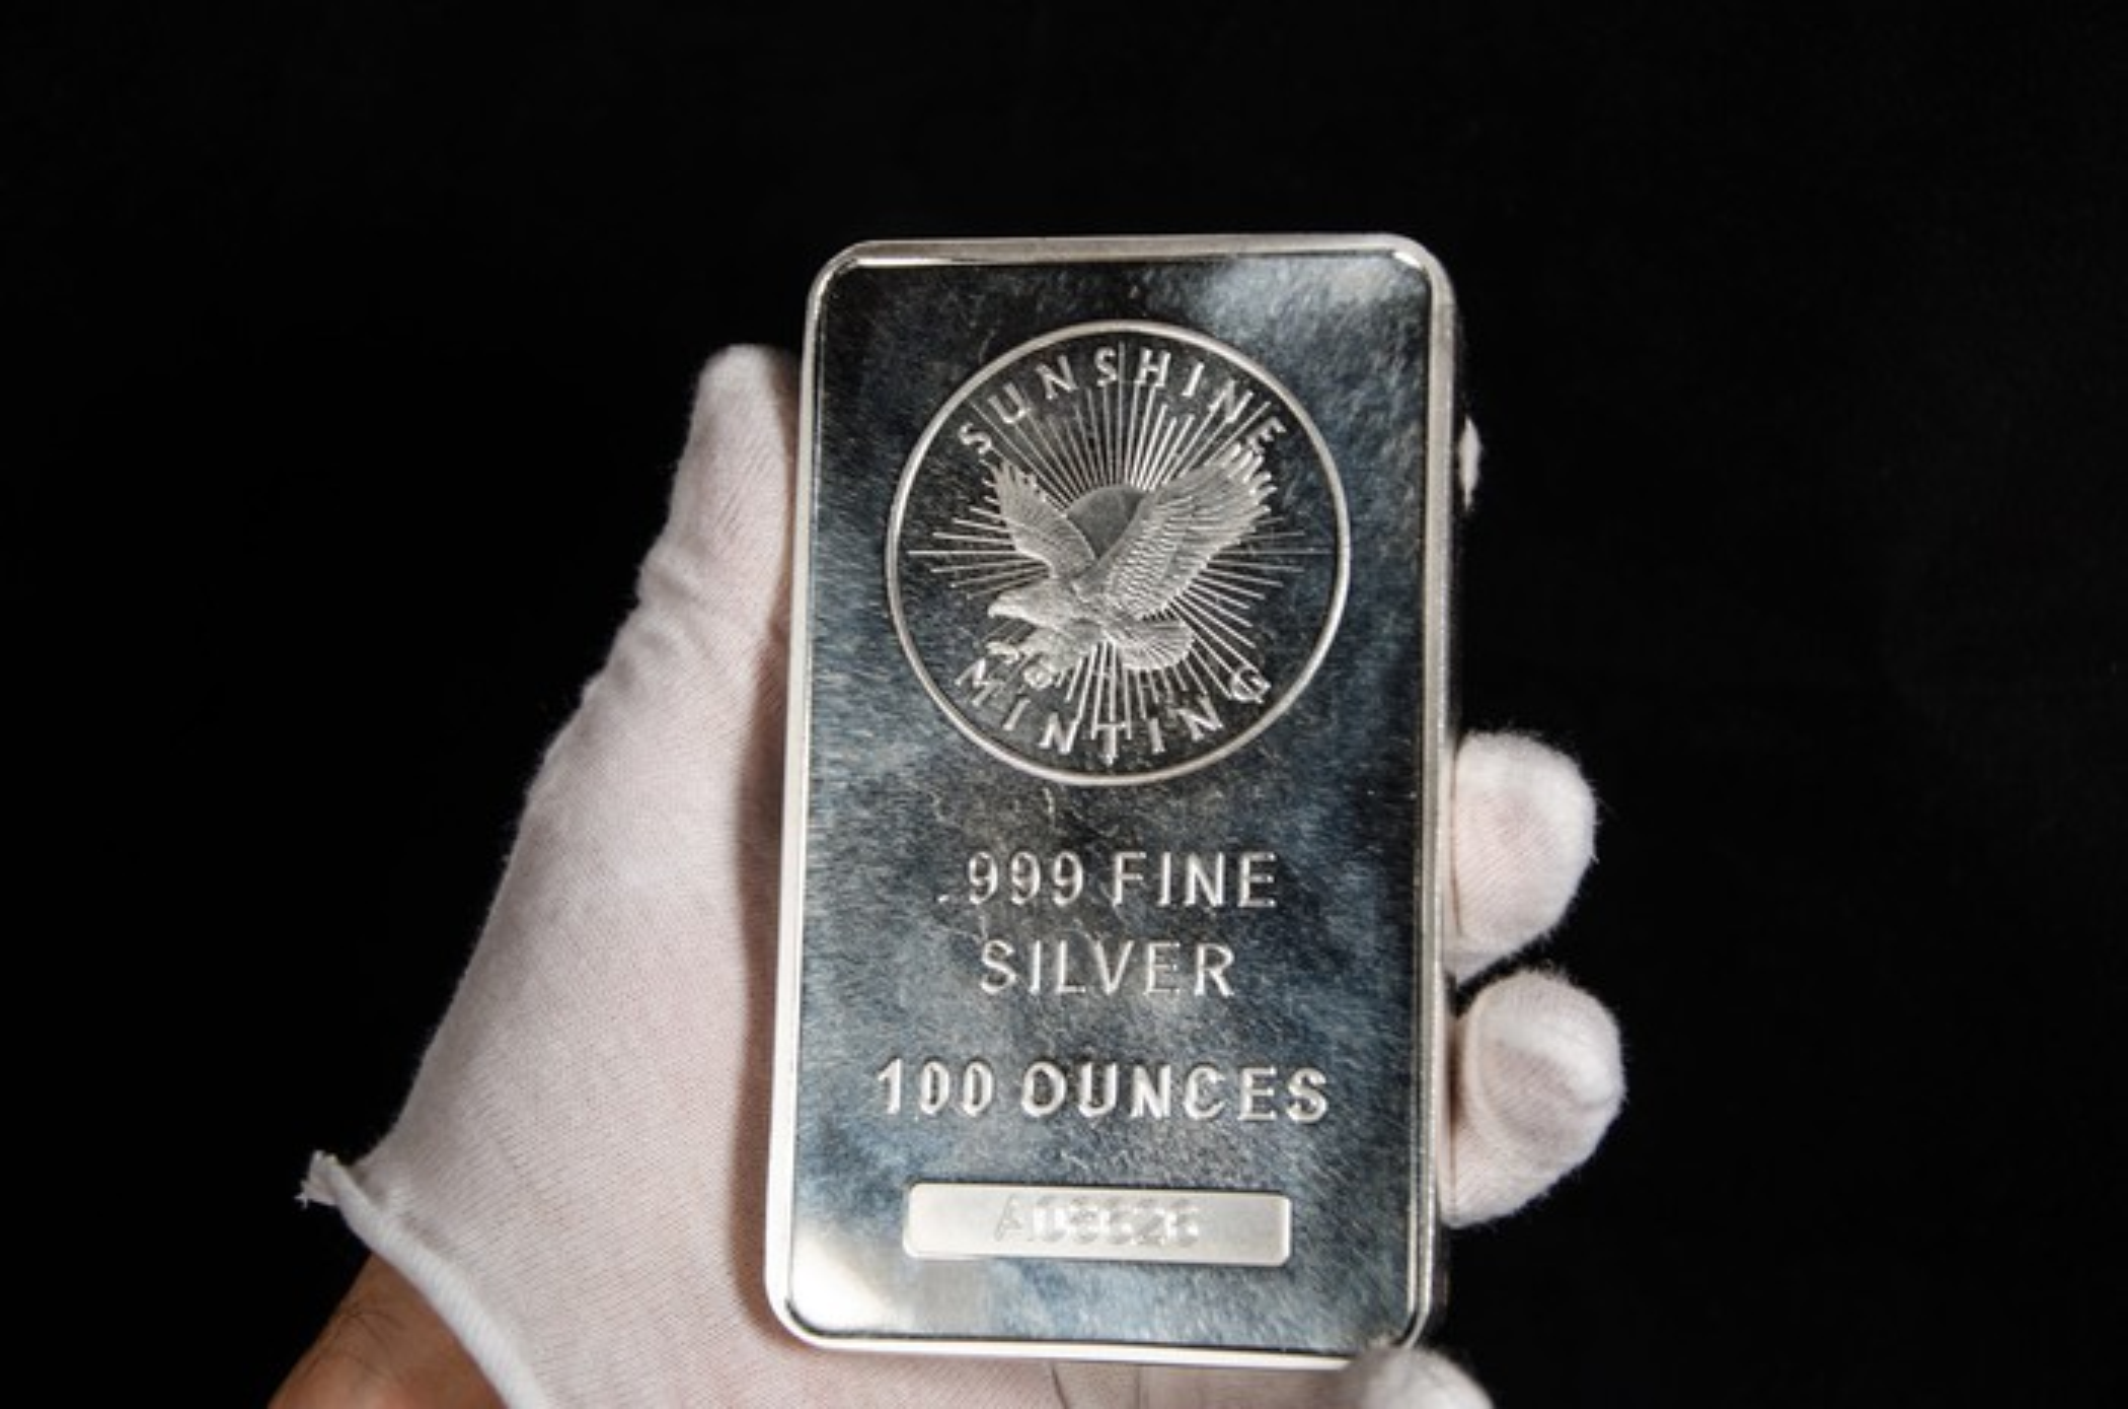 A hand holding a silver bar